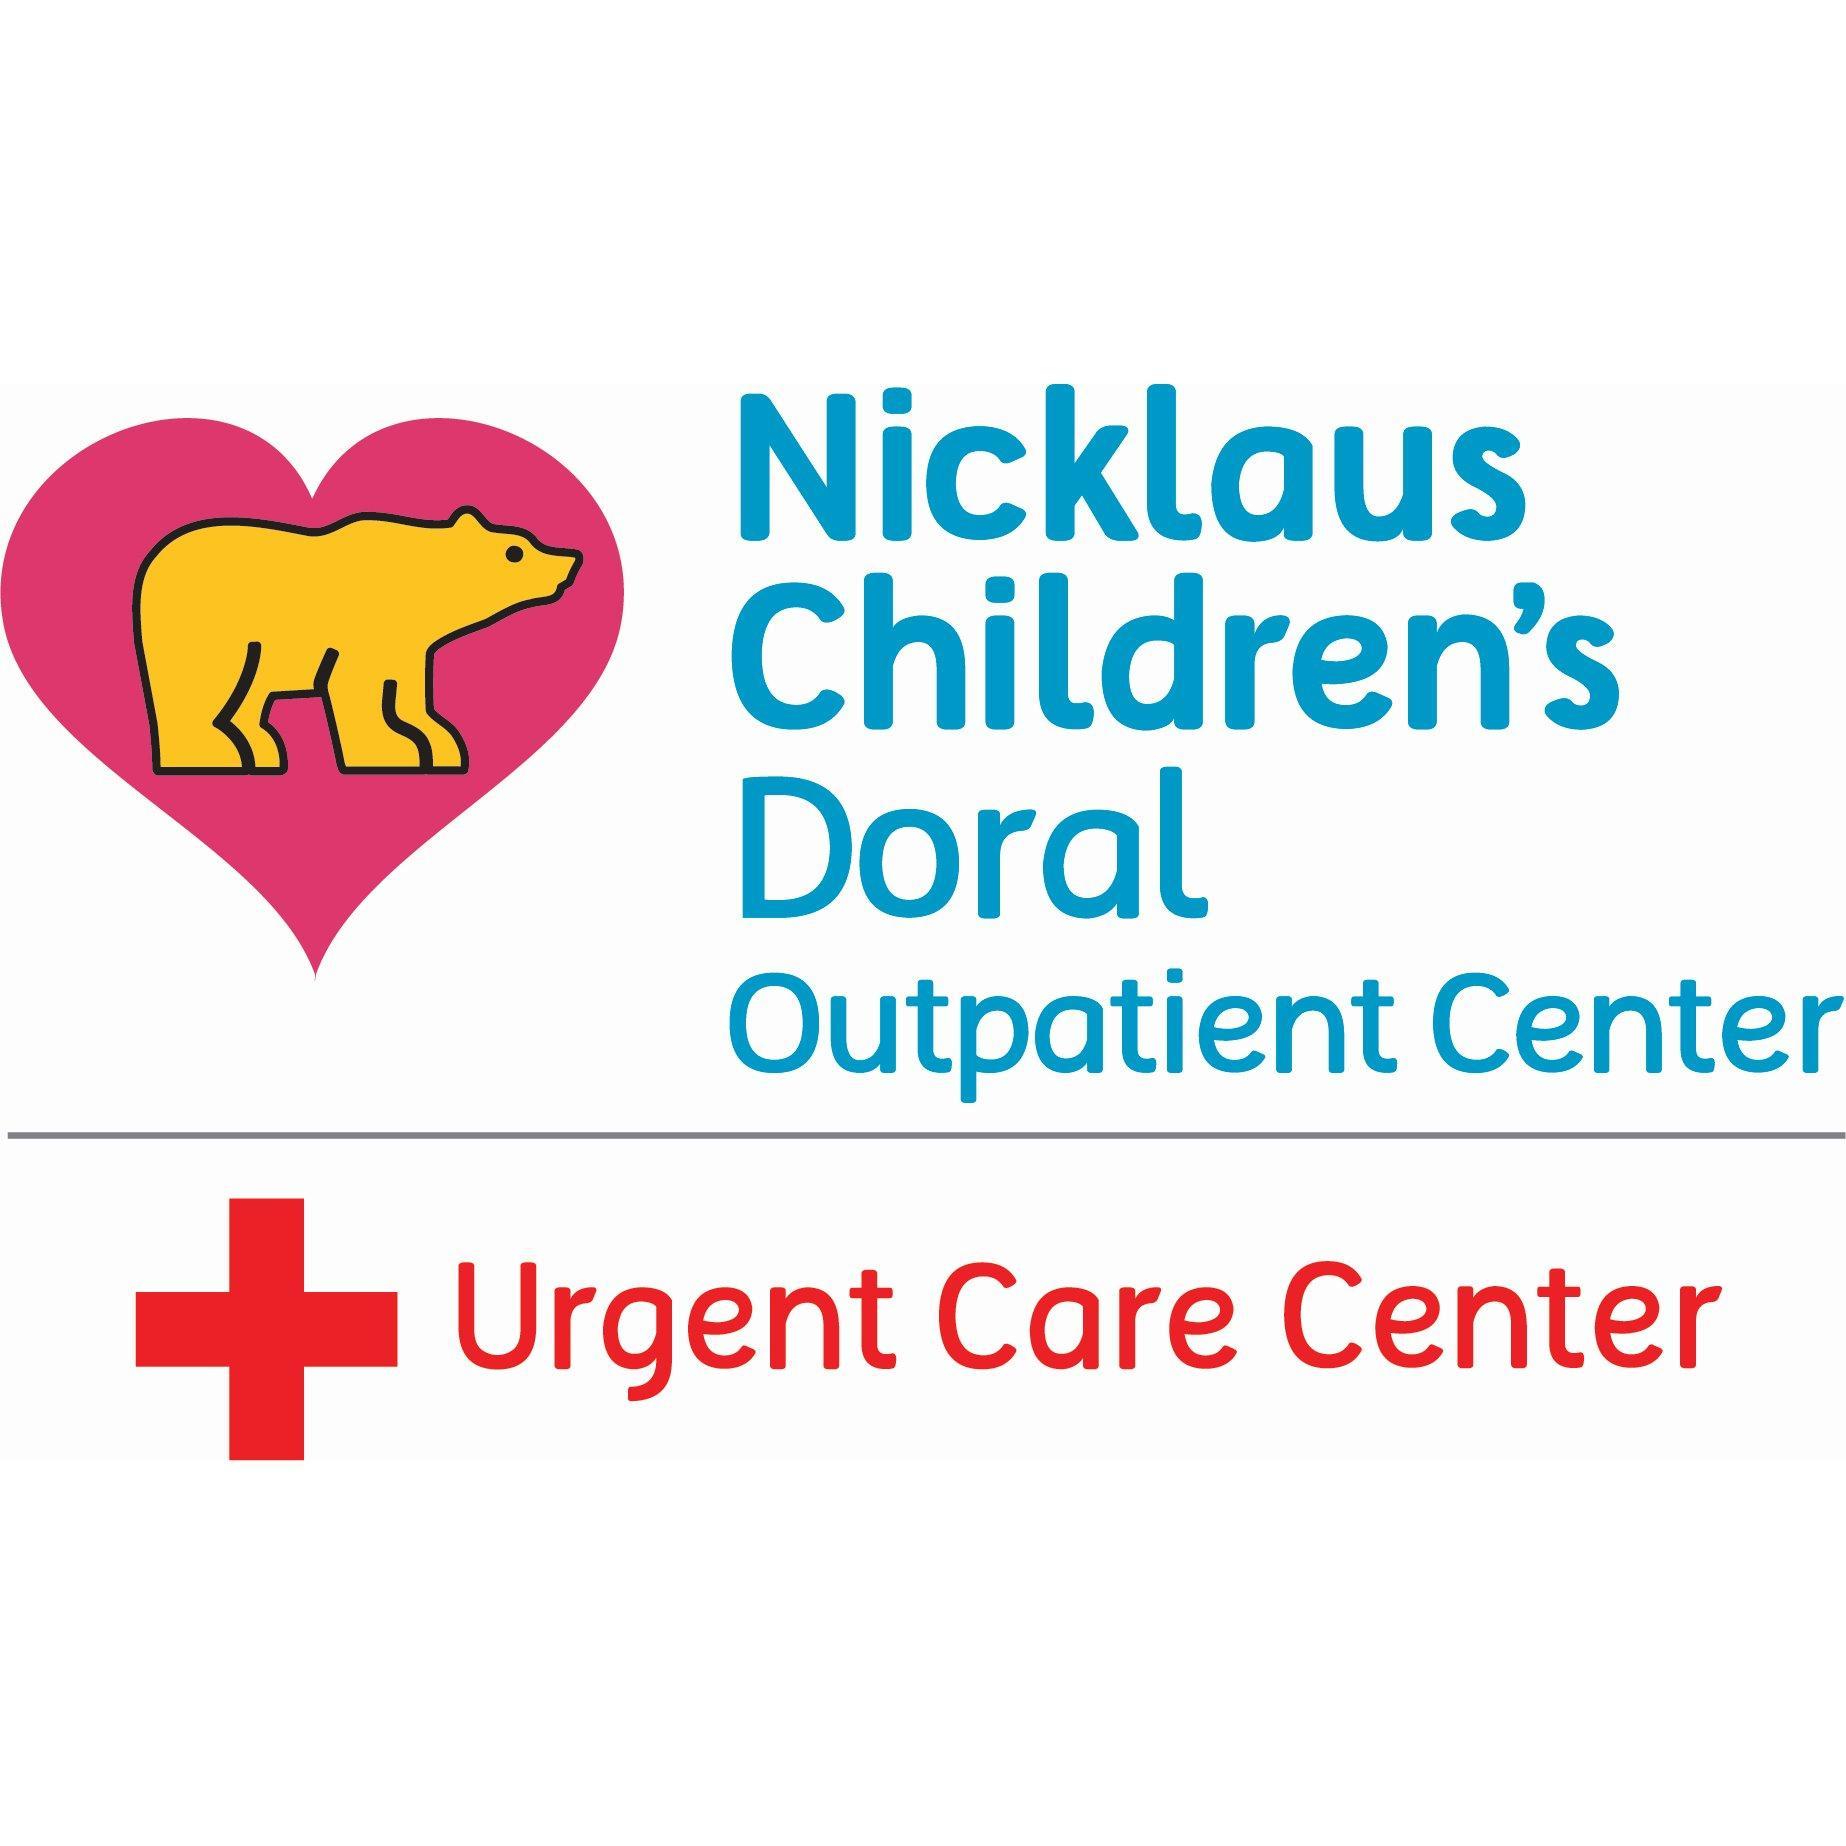 Nicklaus Children's Doral Urgent Care Center